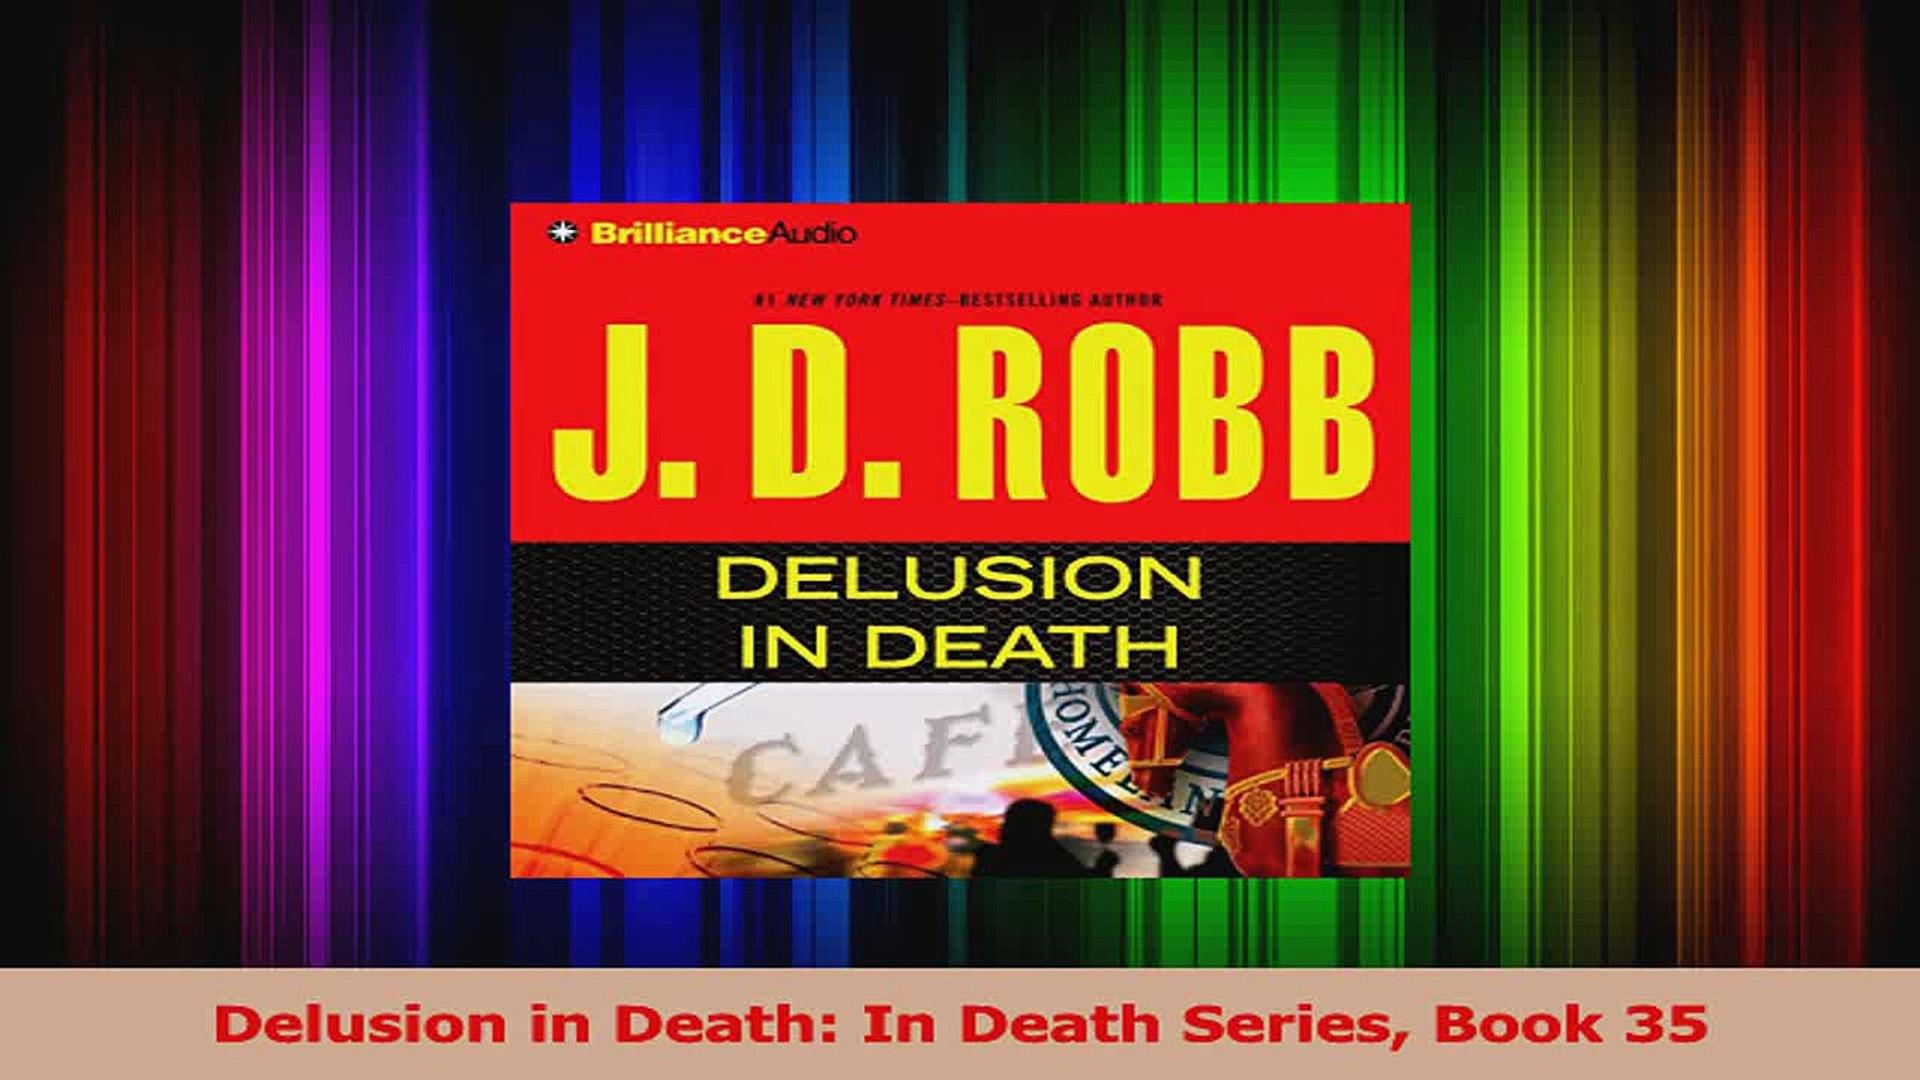 celebrity in death jd robb pdf free download